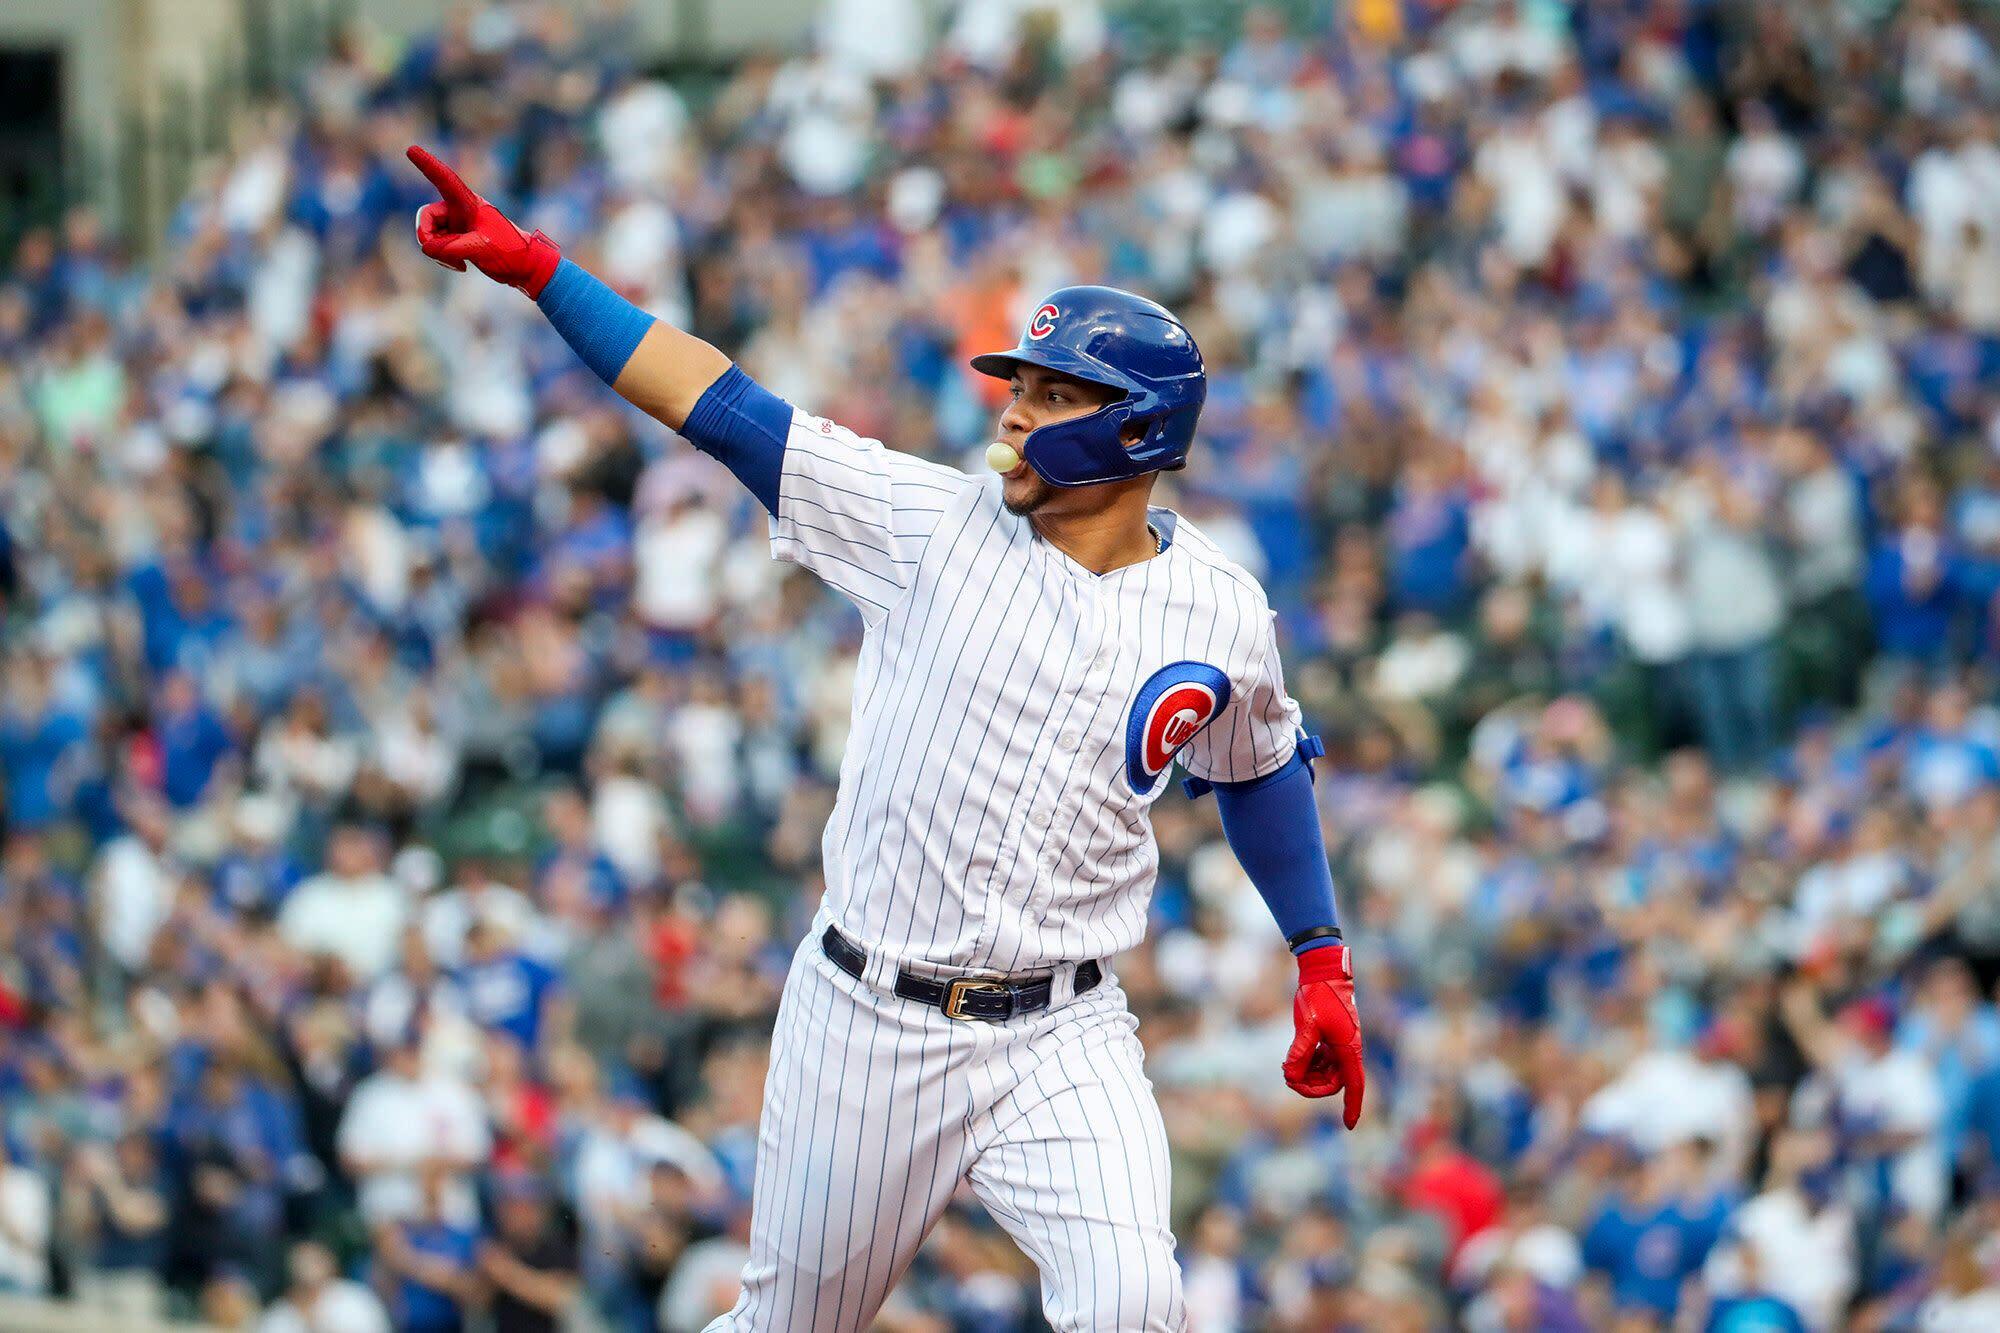 a03dac0e3 MLB Power Rankings: Cubs, Twins rise while Dodgers remain No. 1